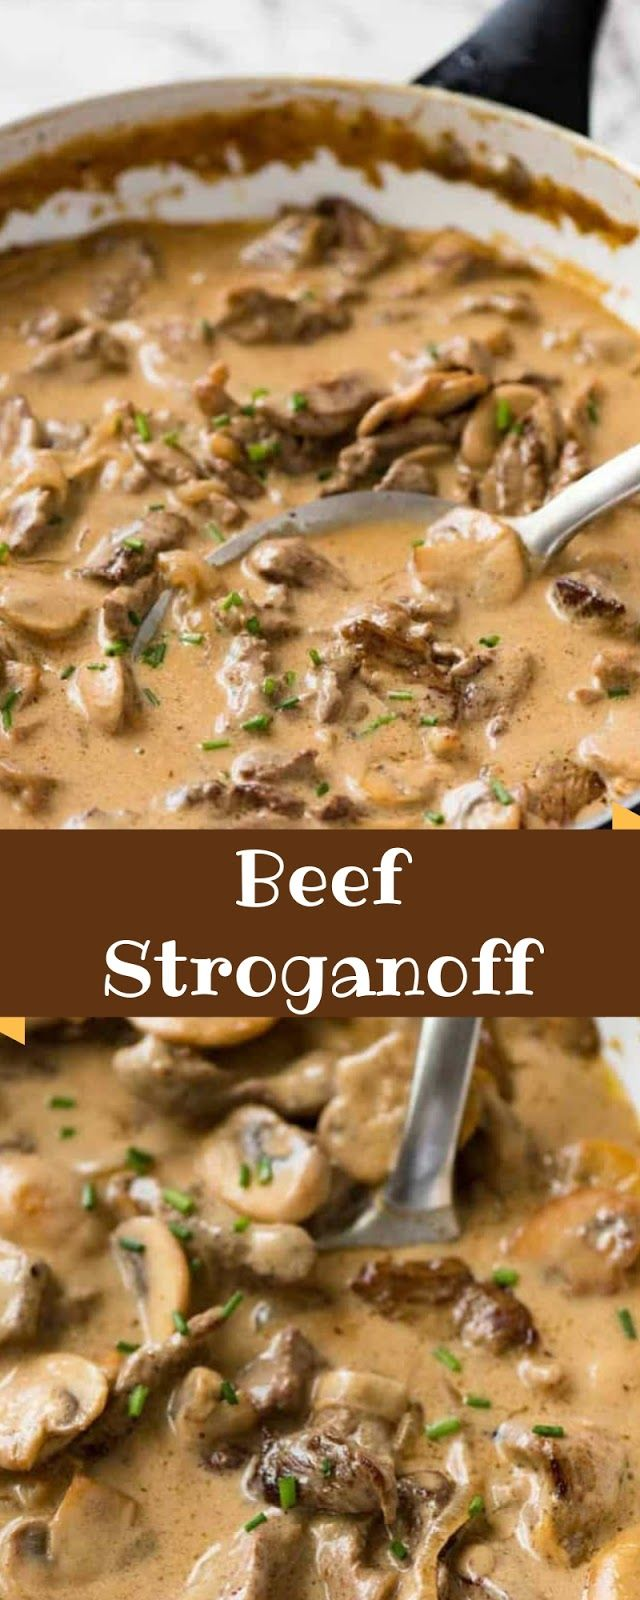 Beef Stroganoff images